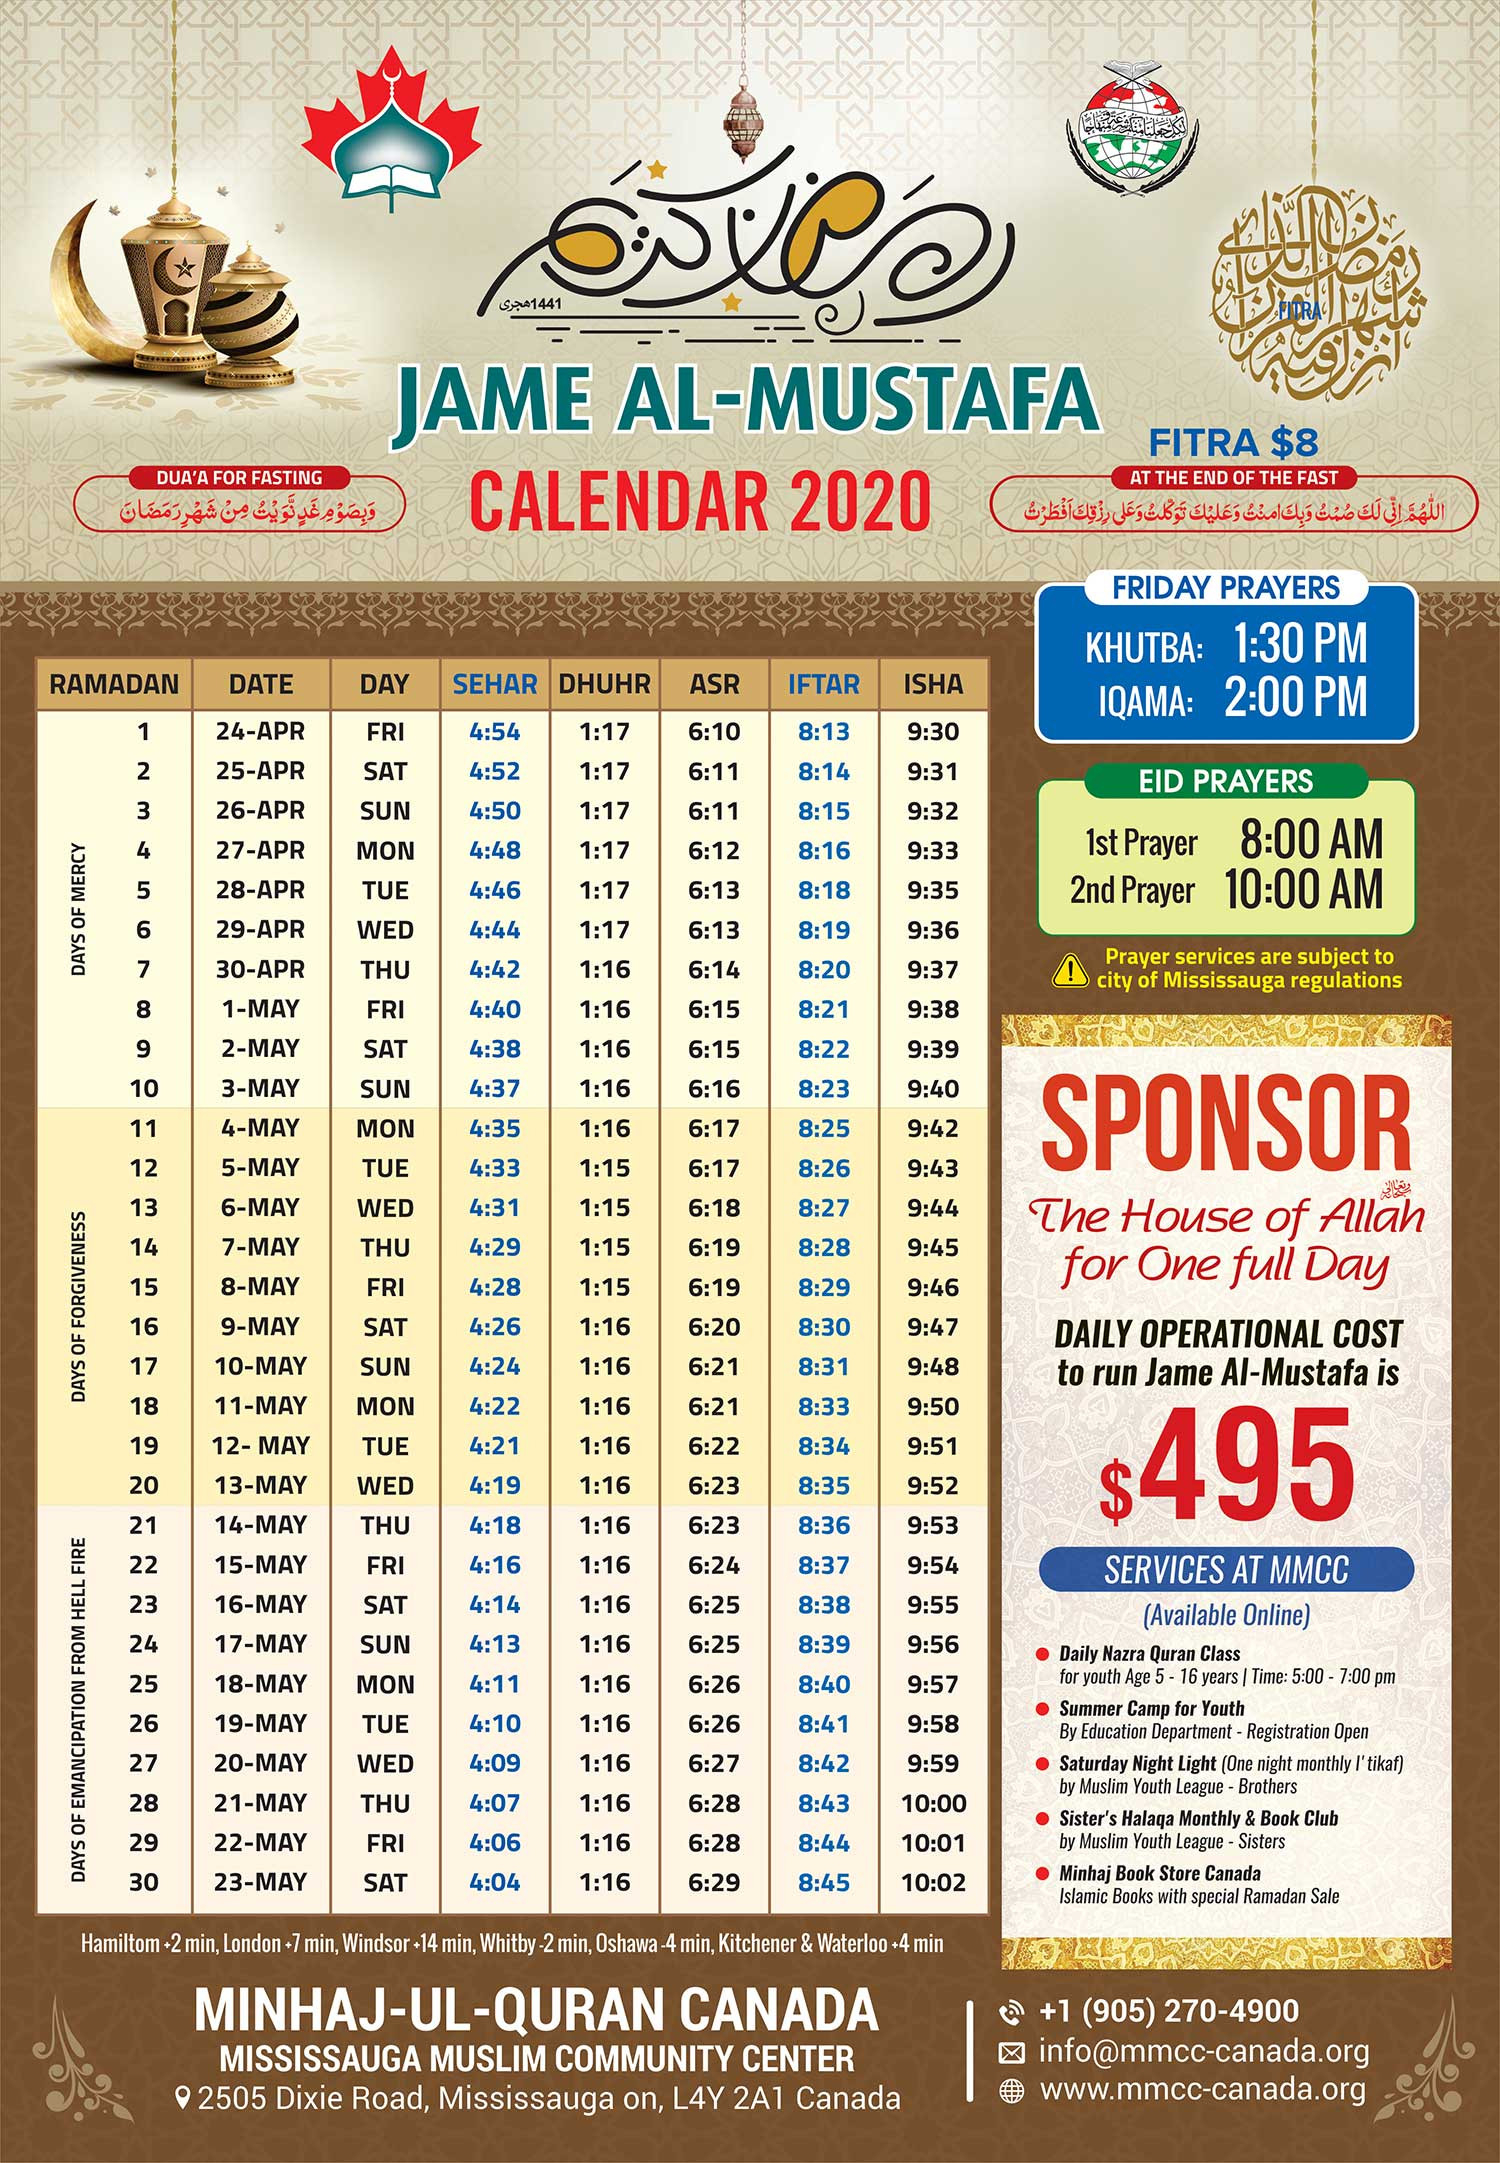 Ramadan Calendar 2020 - Mmcc Canada  Printable Muslim Prayer Times Whole Year 2021